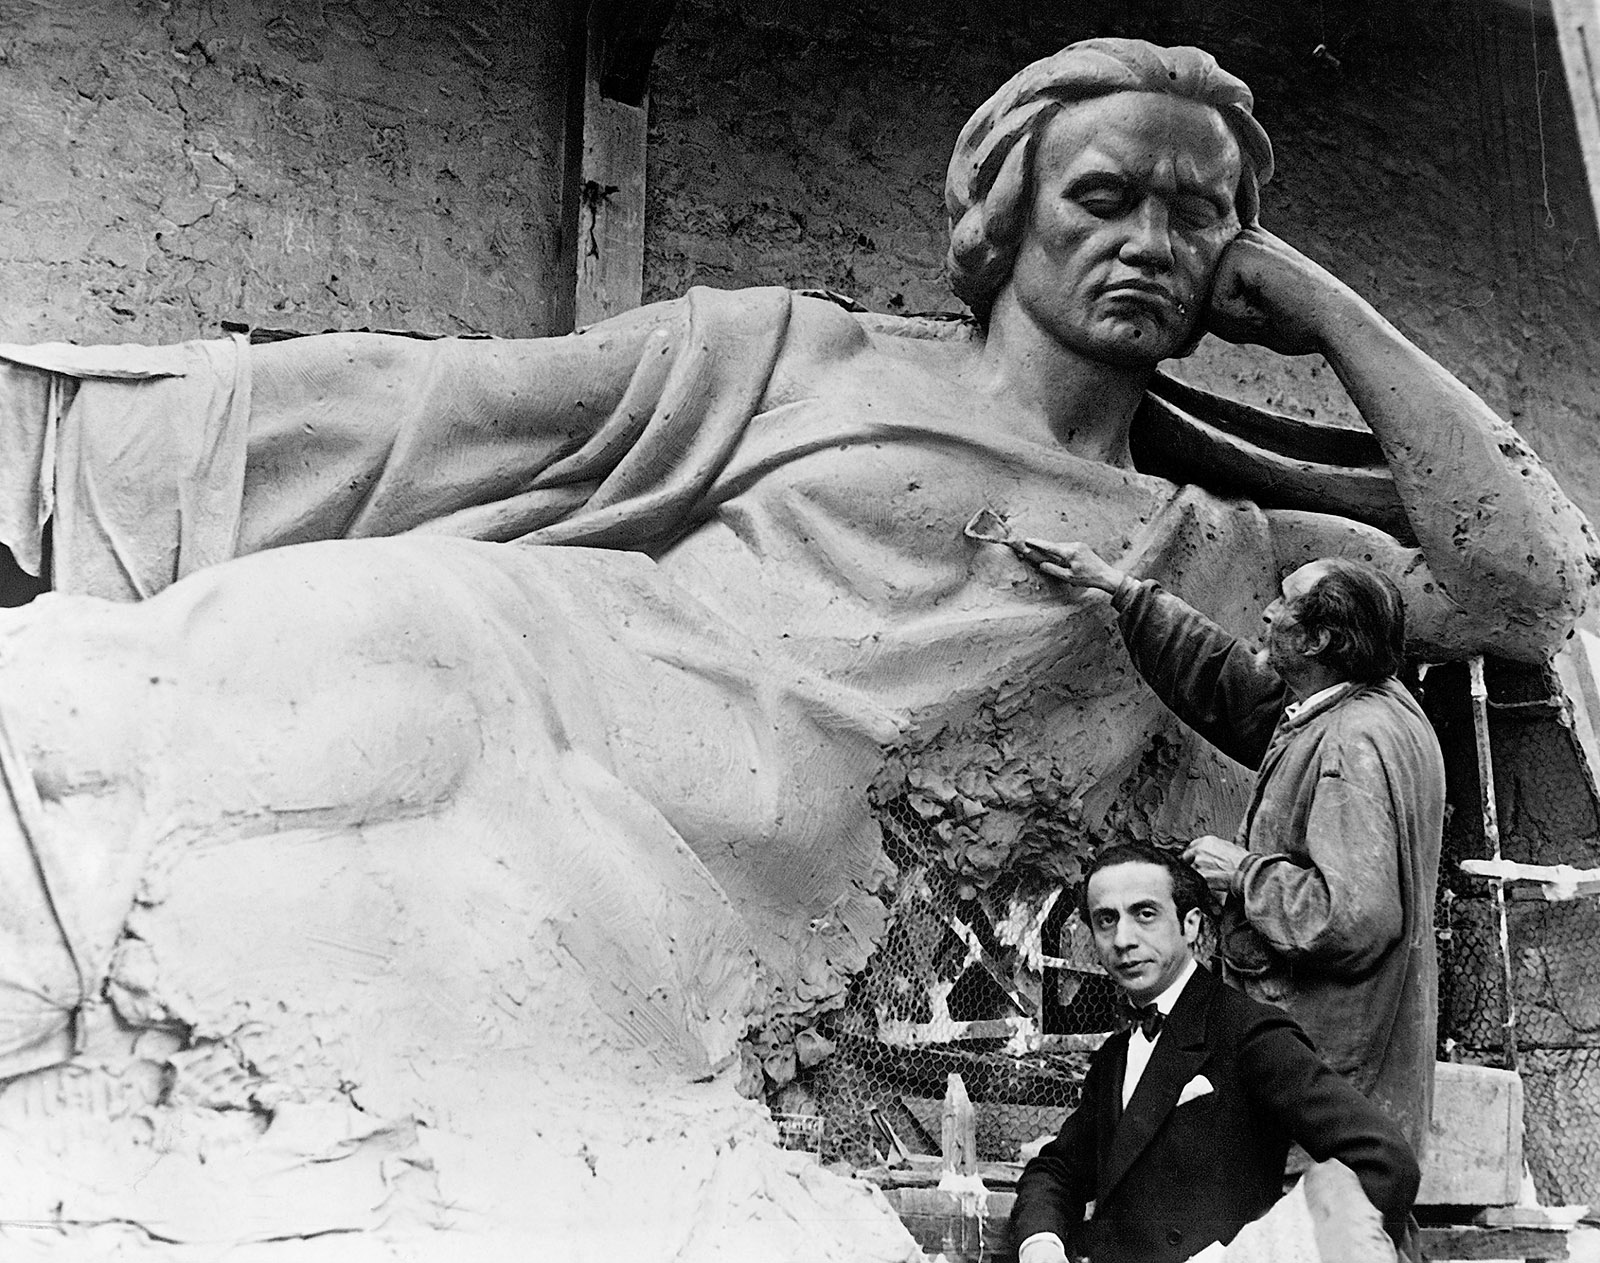 Jean-Marie Mengue working on his sculpture of Beethoven in the Bois de Vincennes, Paris, 1927